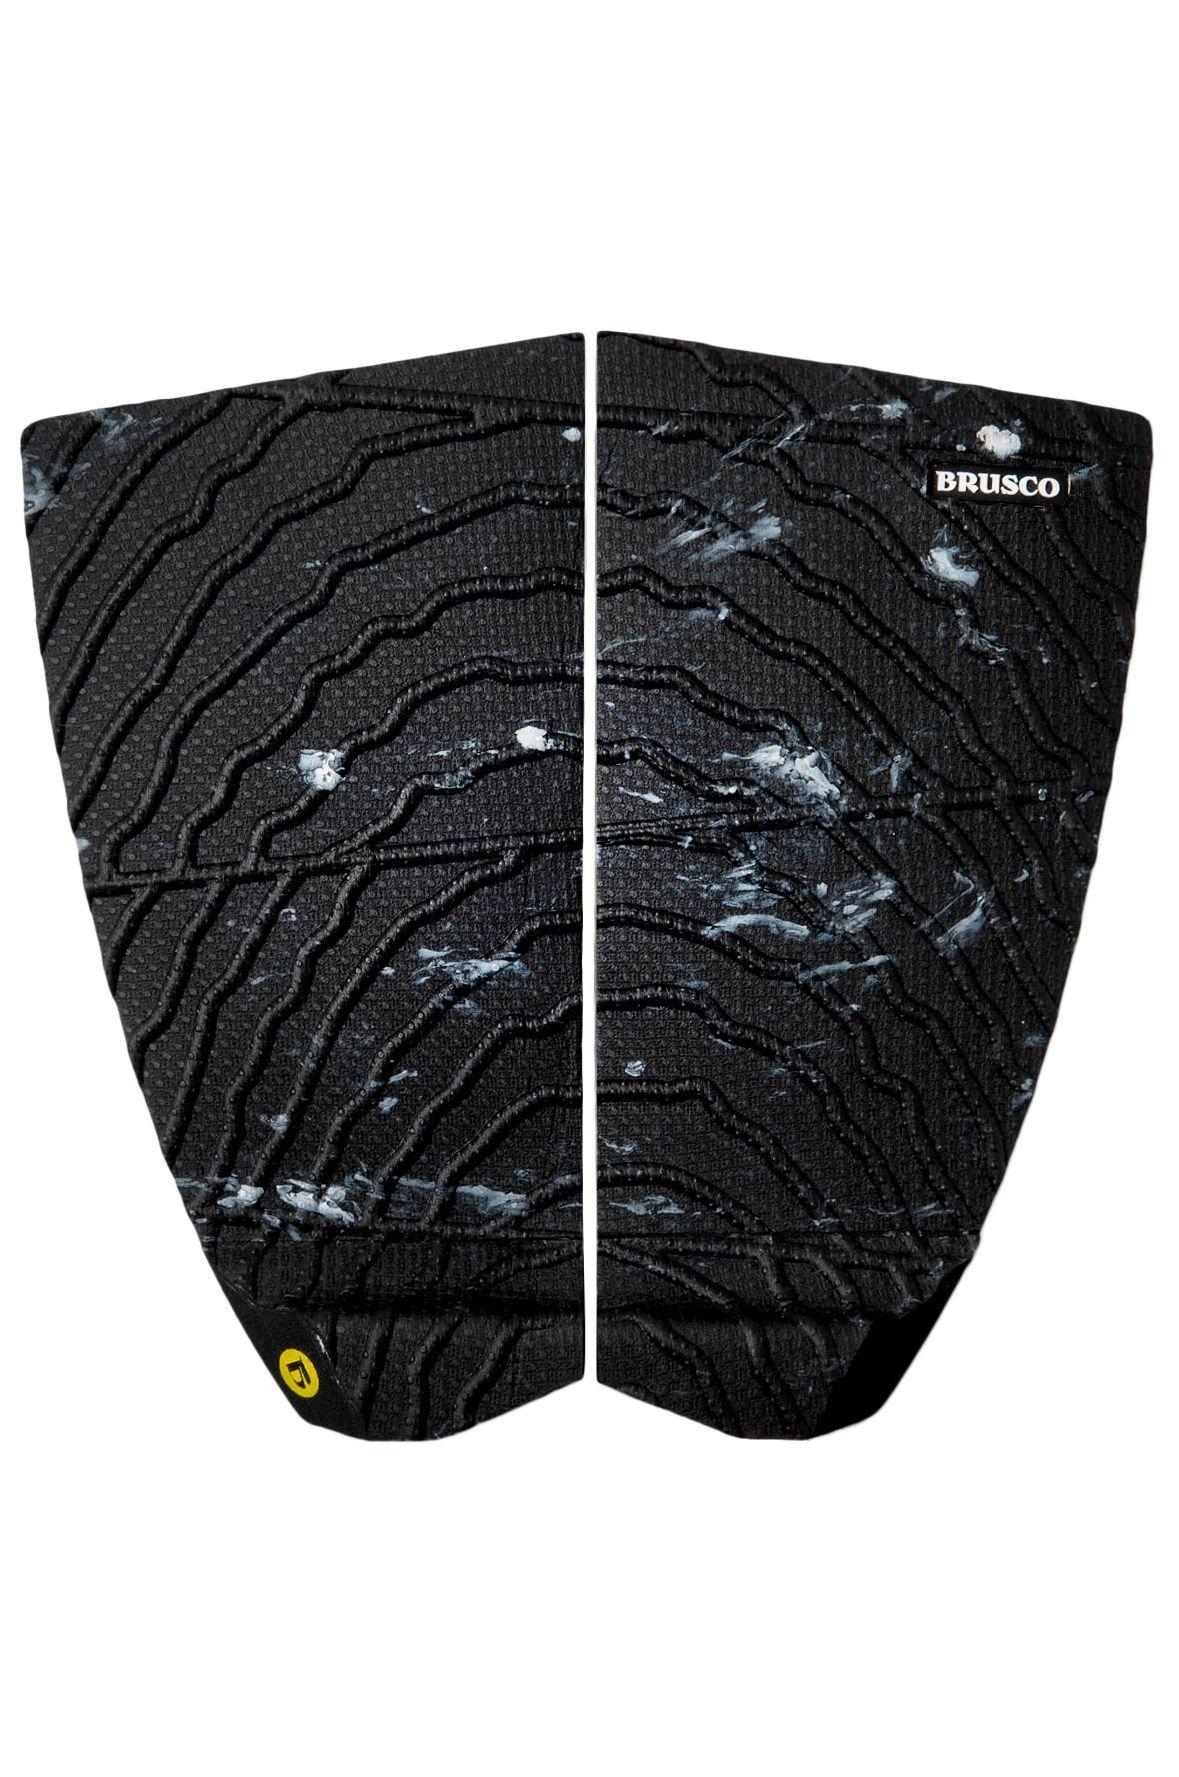 Deck Brusco TAILPAD RUGGED GRIP LIMESTONE 2PCS Black/White